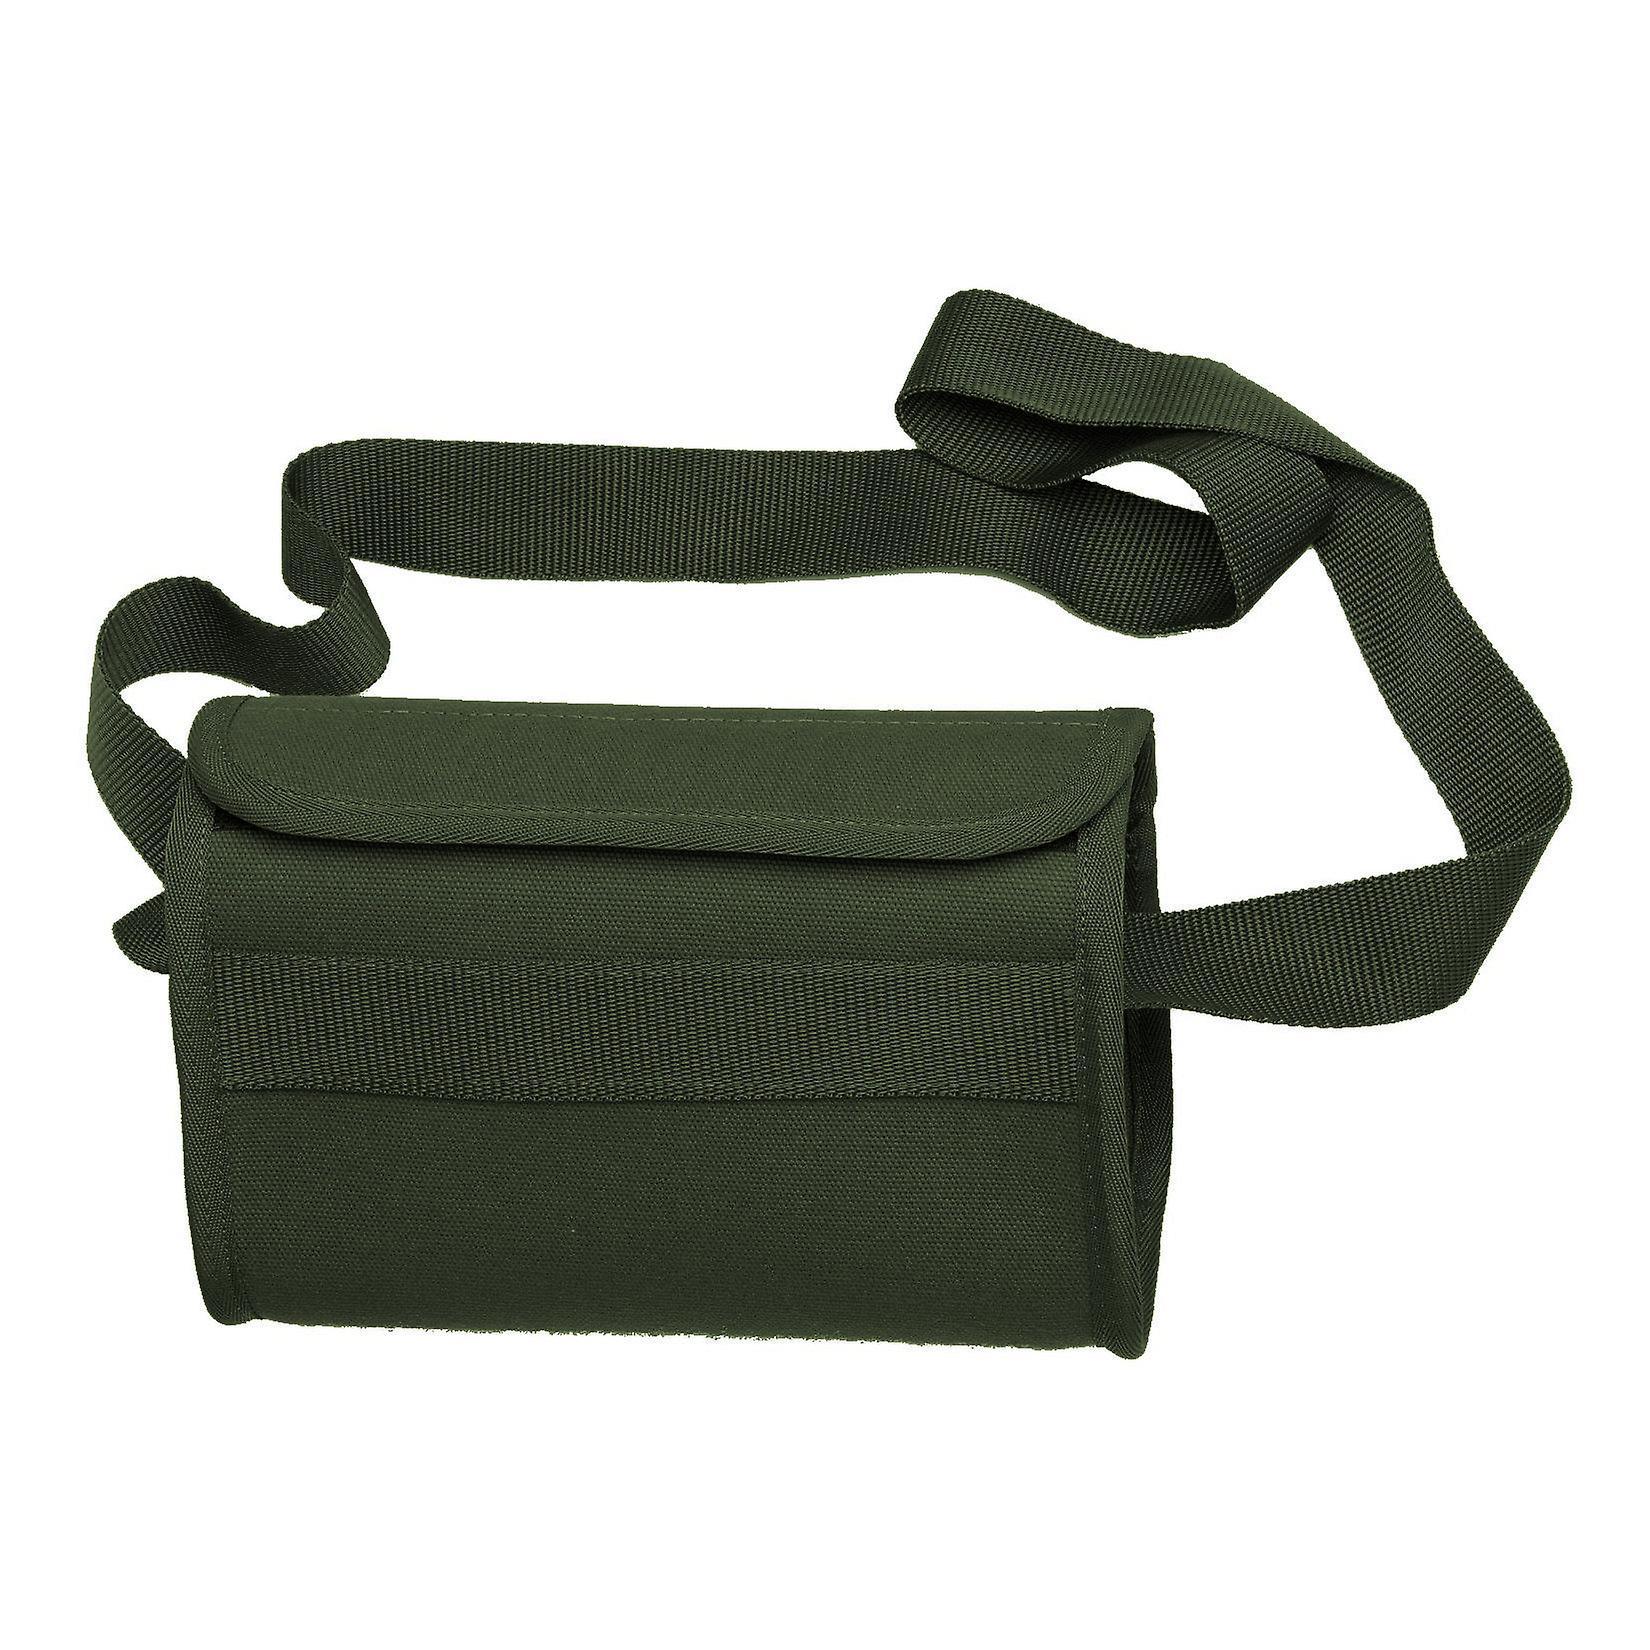 BISLEY Clay Shooters cartridge bag 100 capacity Green canvas bag